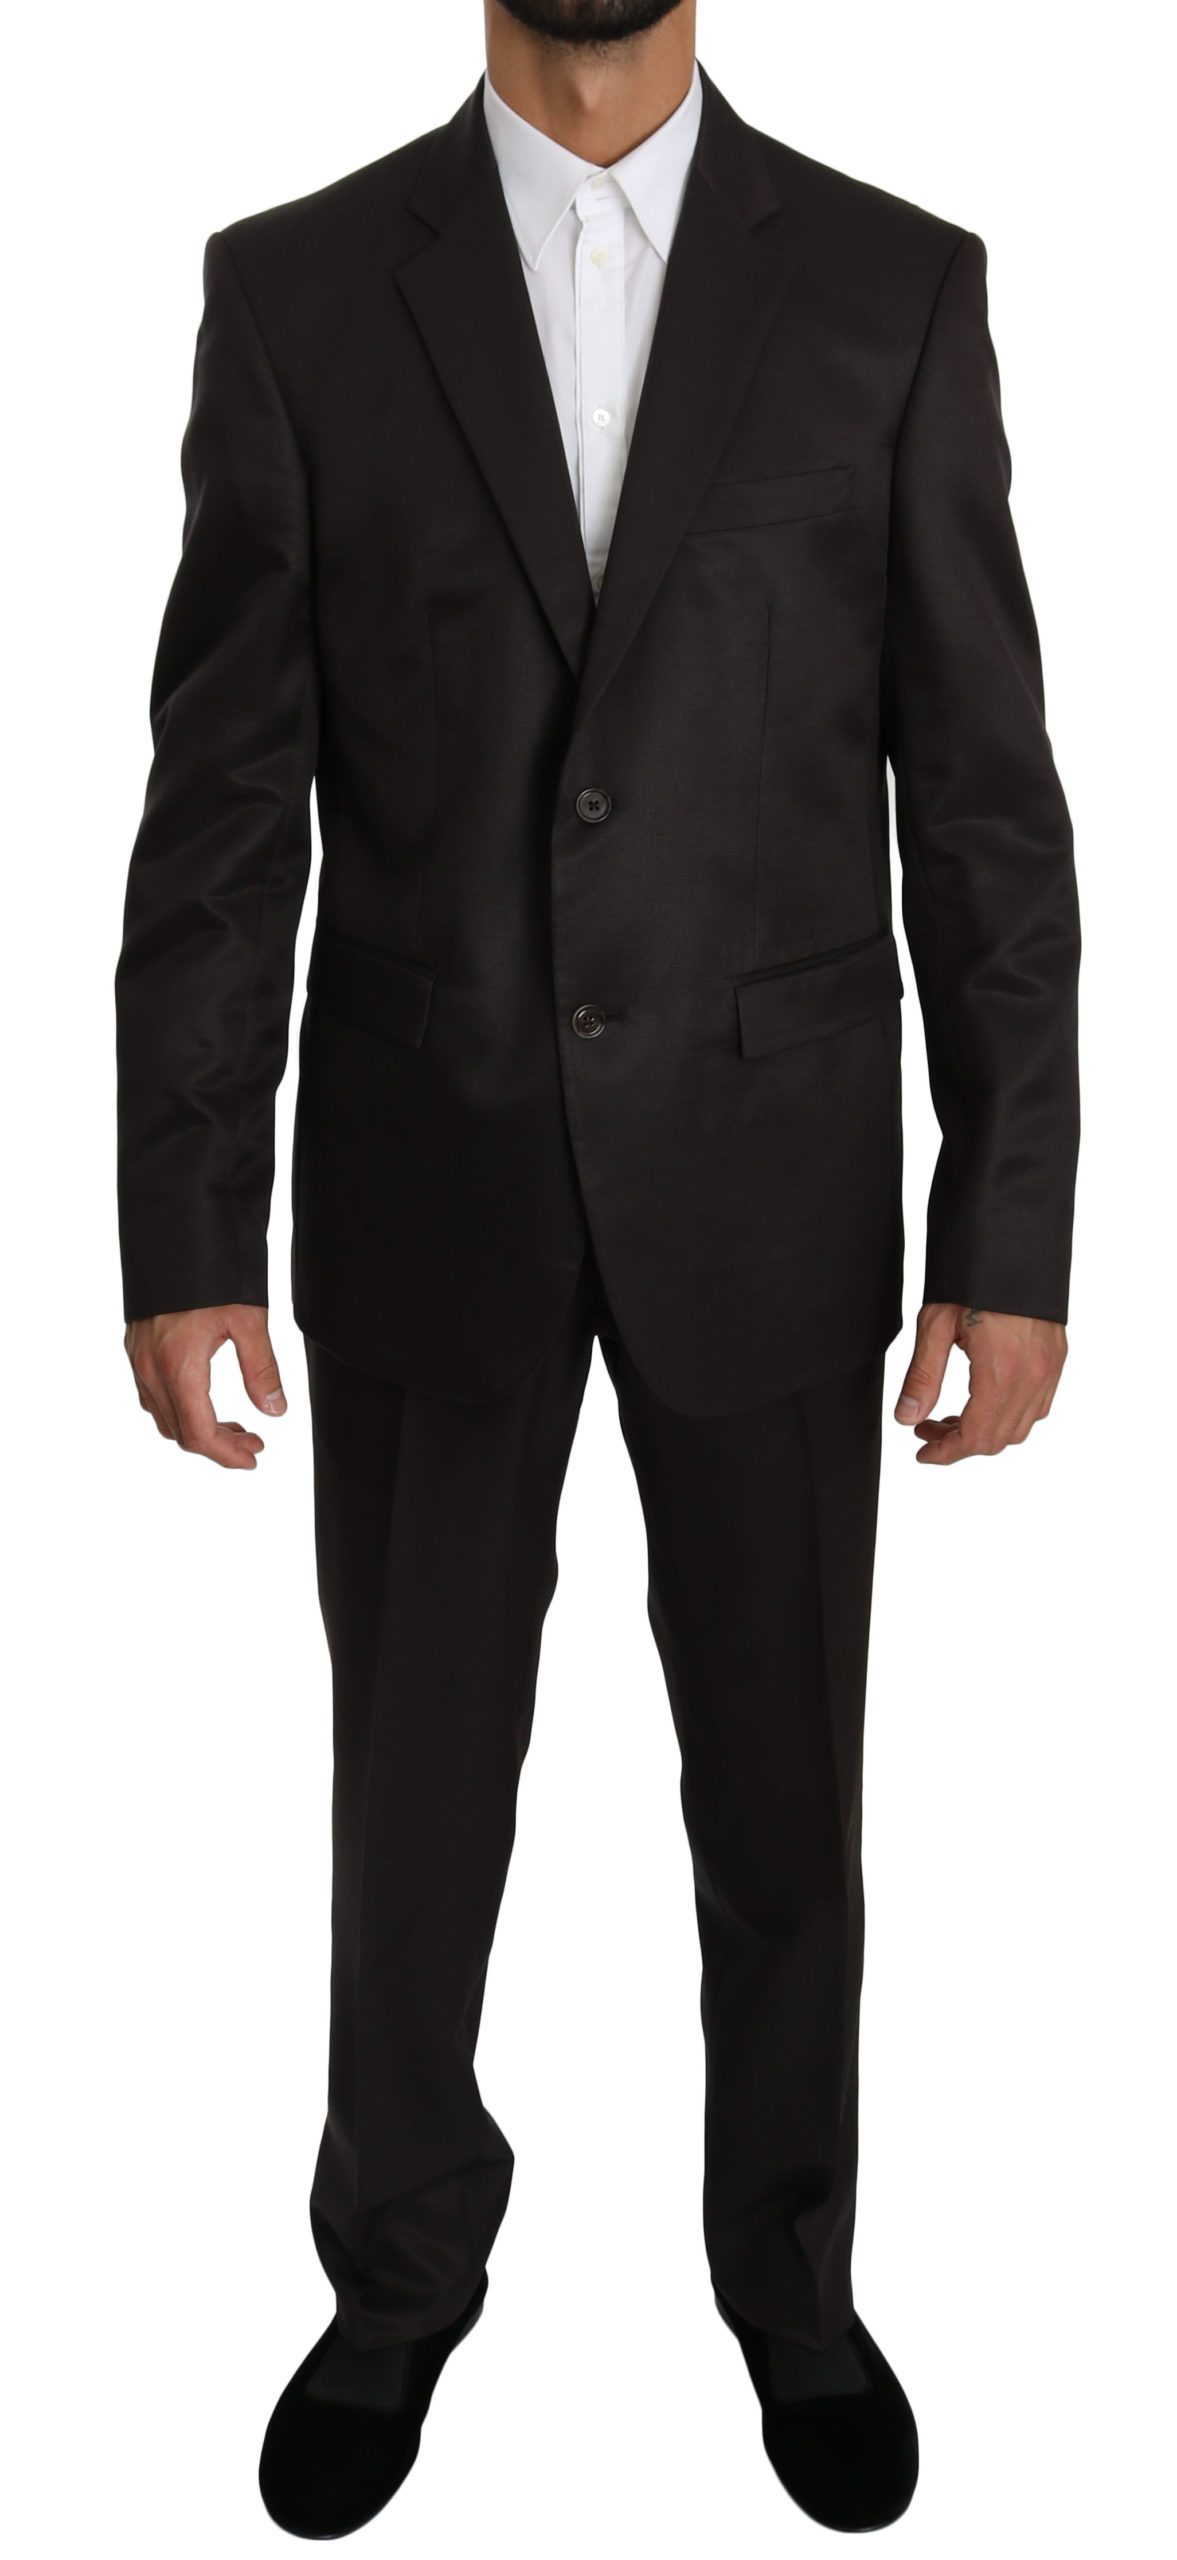 Dolce & Gabbana Men's Slim Fit 2 Piece Wool Silk Suit Brown KOS1609 - IT50   L